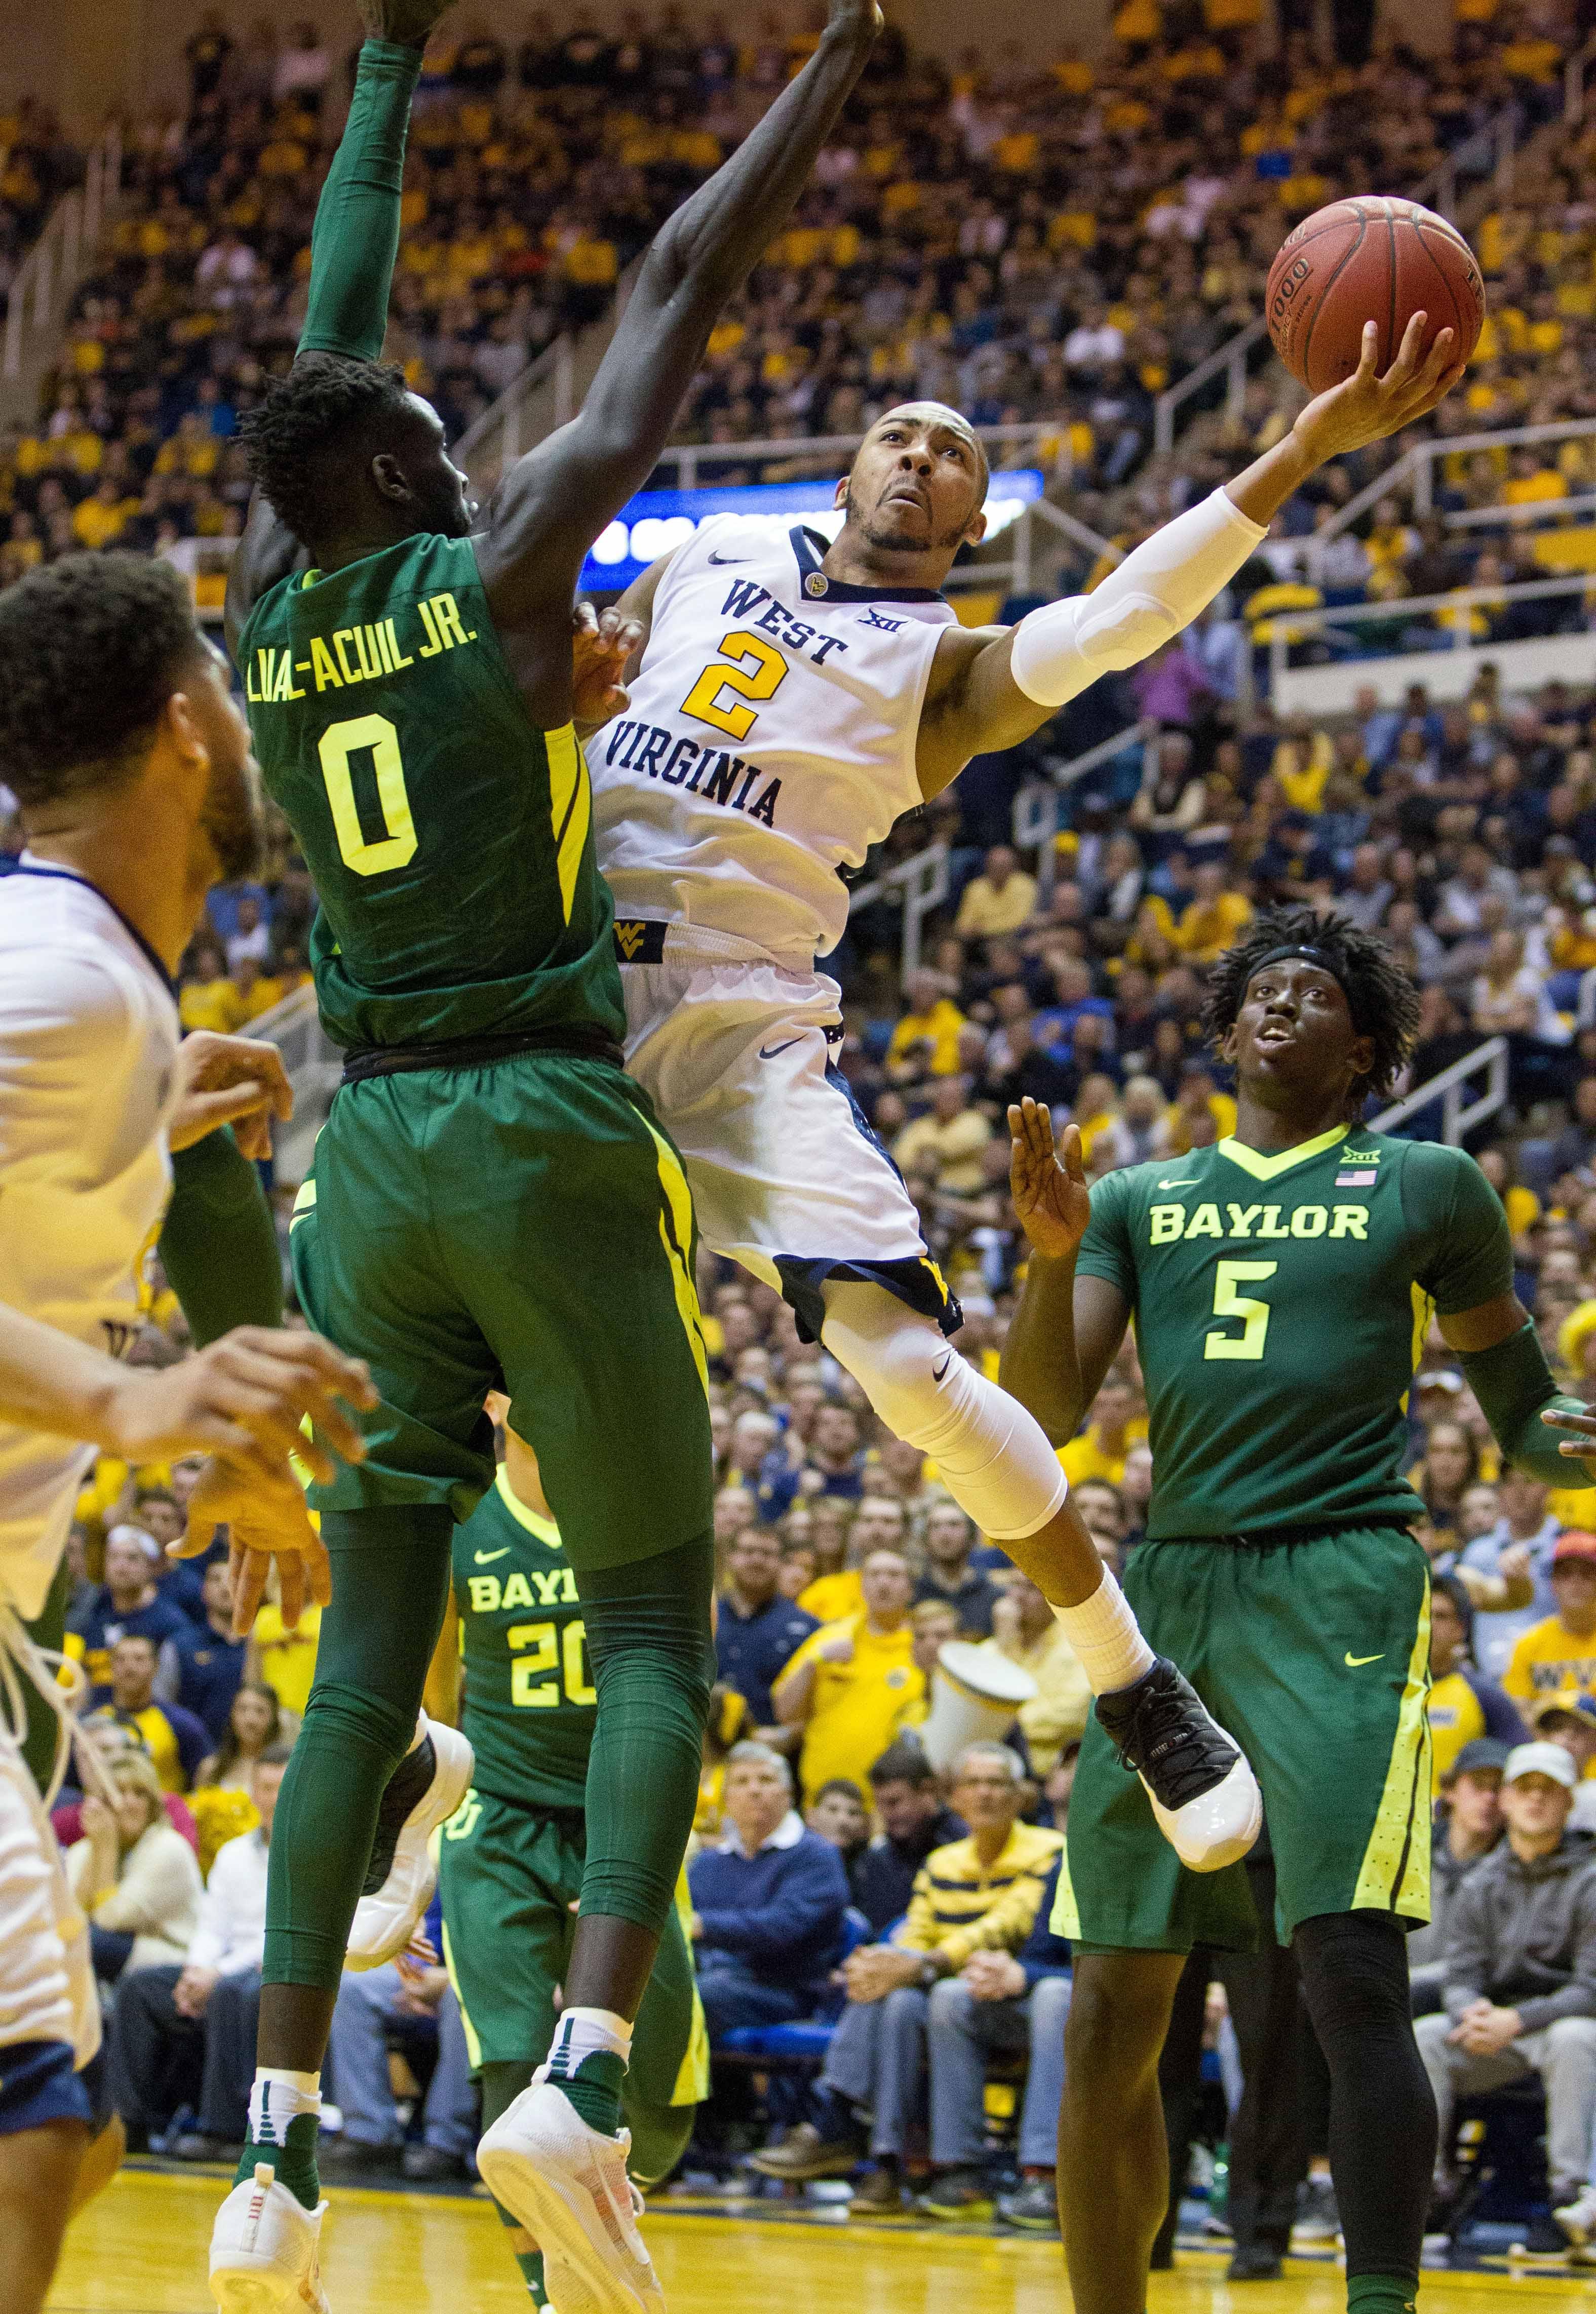 uk vs south carolina basketball score pick against the spread nba